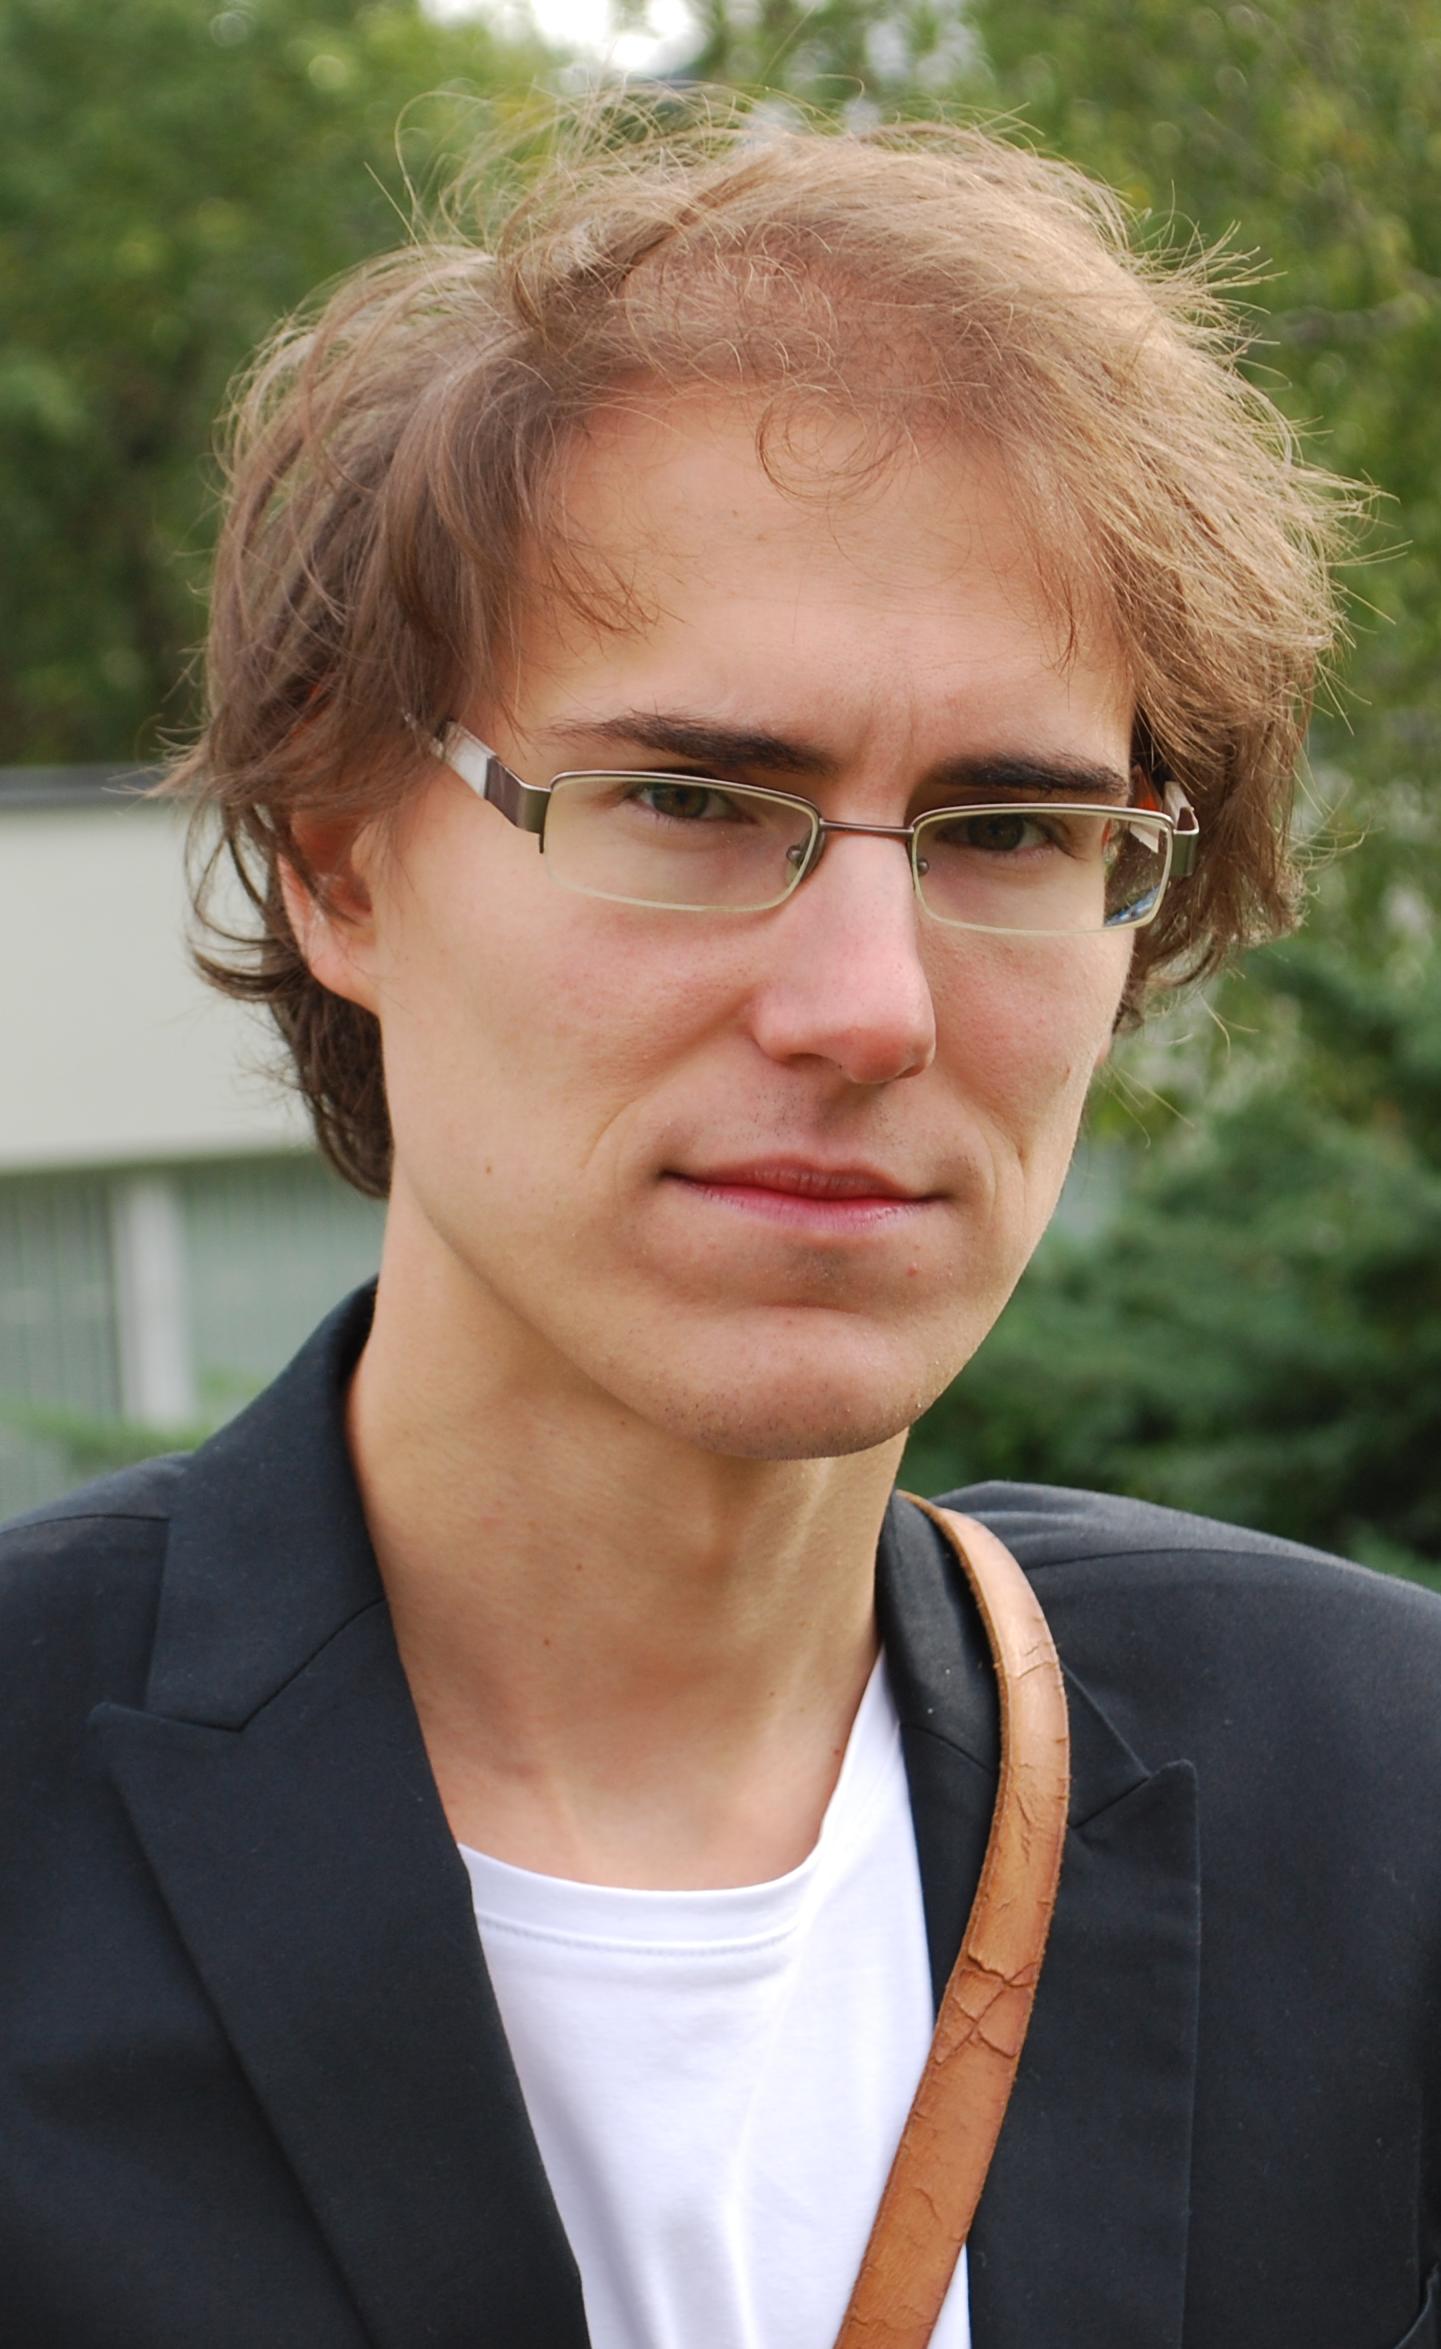 Mgr. art. Peter Pokorný